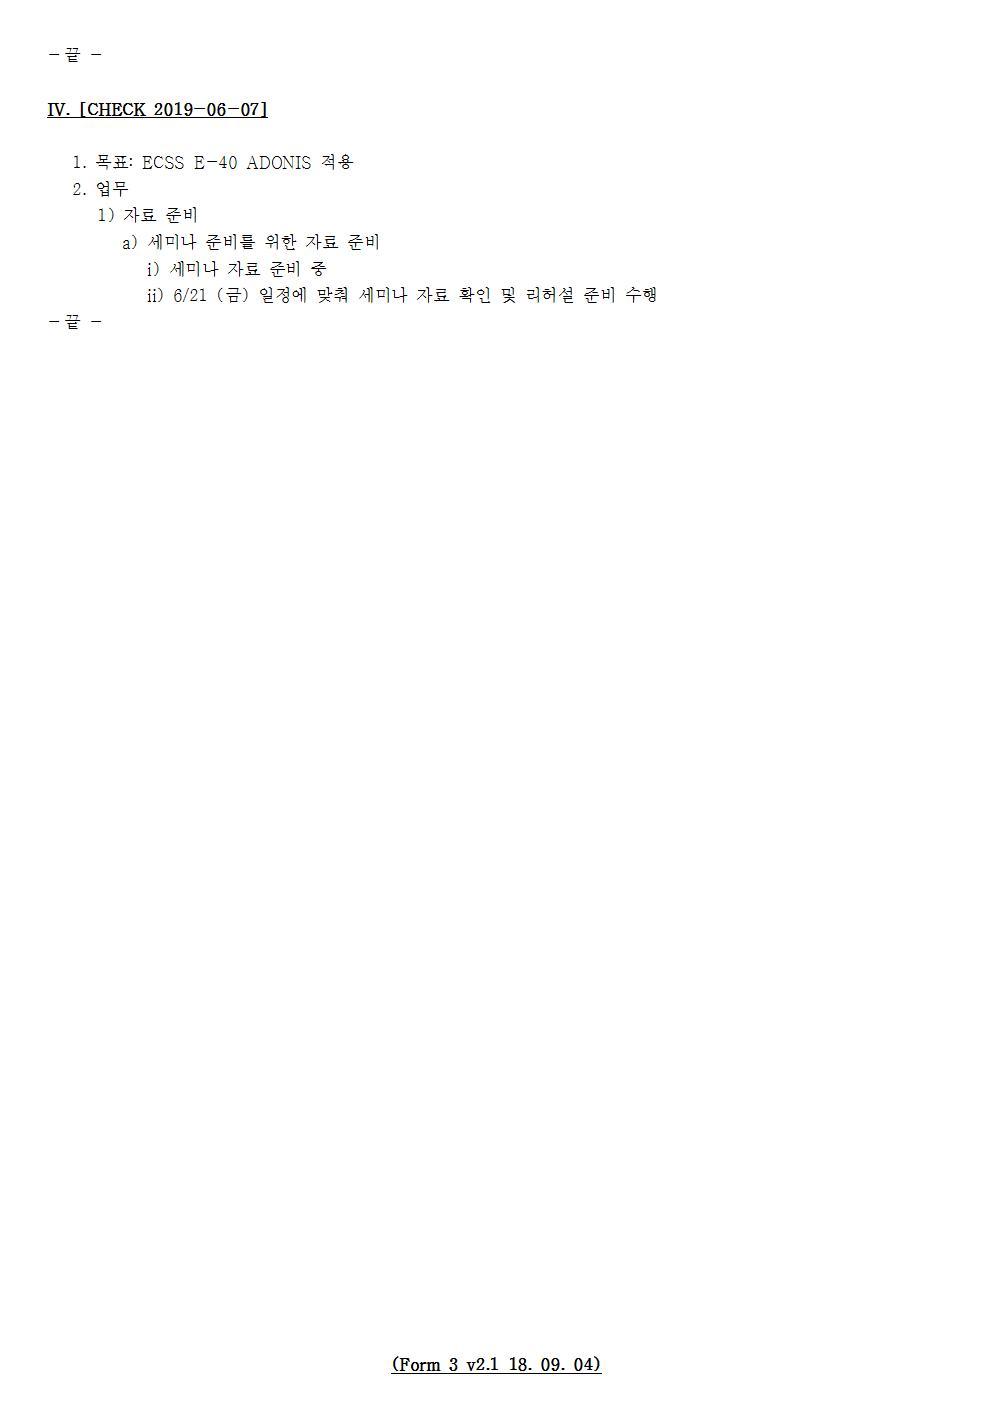 D-[19-004-RD-04]-[CMS]-[2019-06-07][YB]-[19-6-1]-[P+D+C]002.jpg